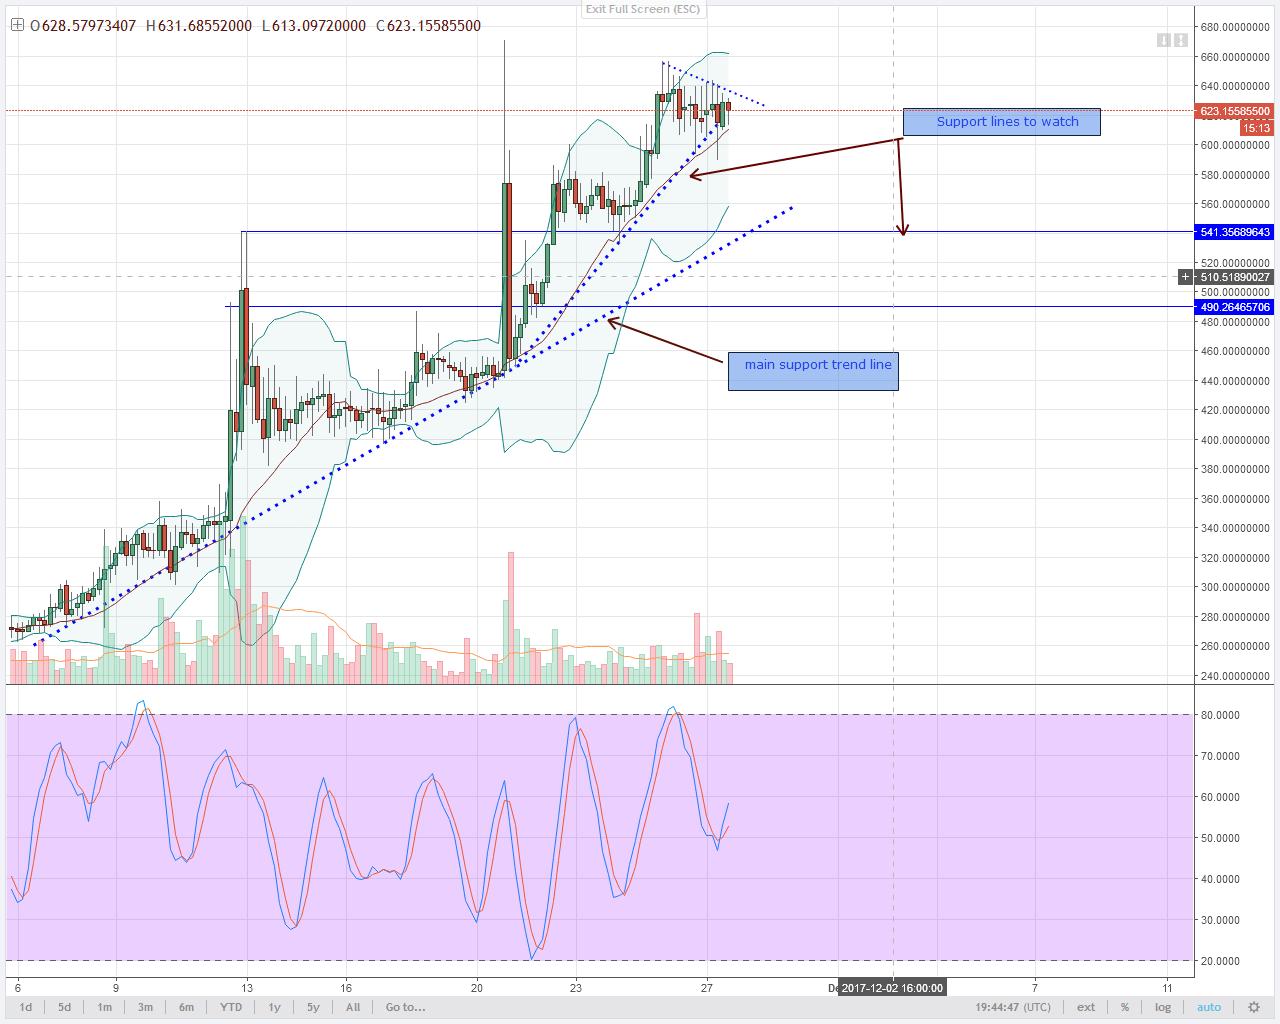 alt coin DASH 4HR chart technical analysis